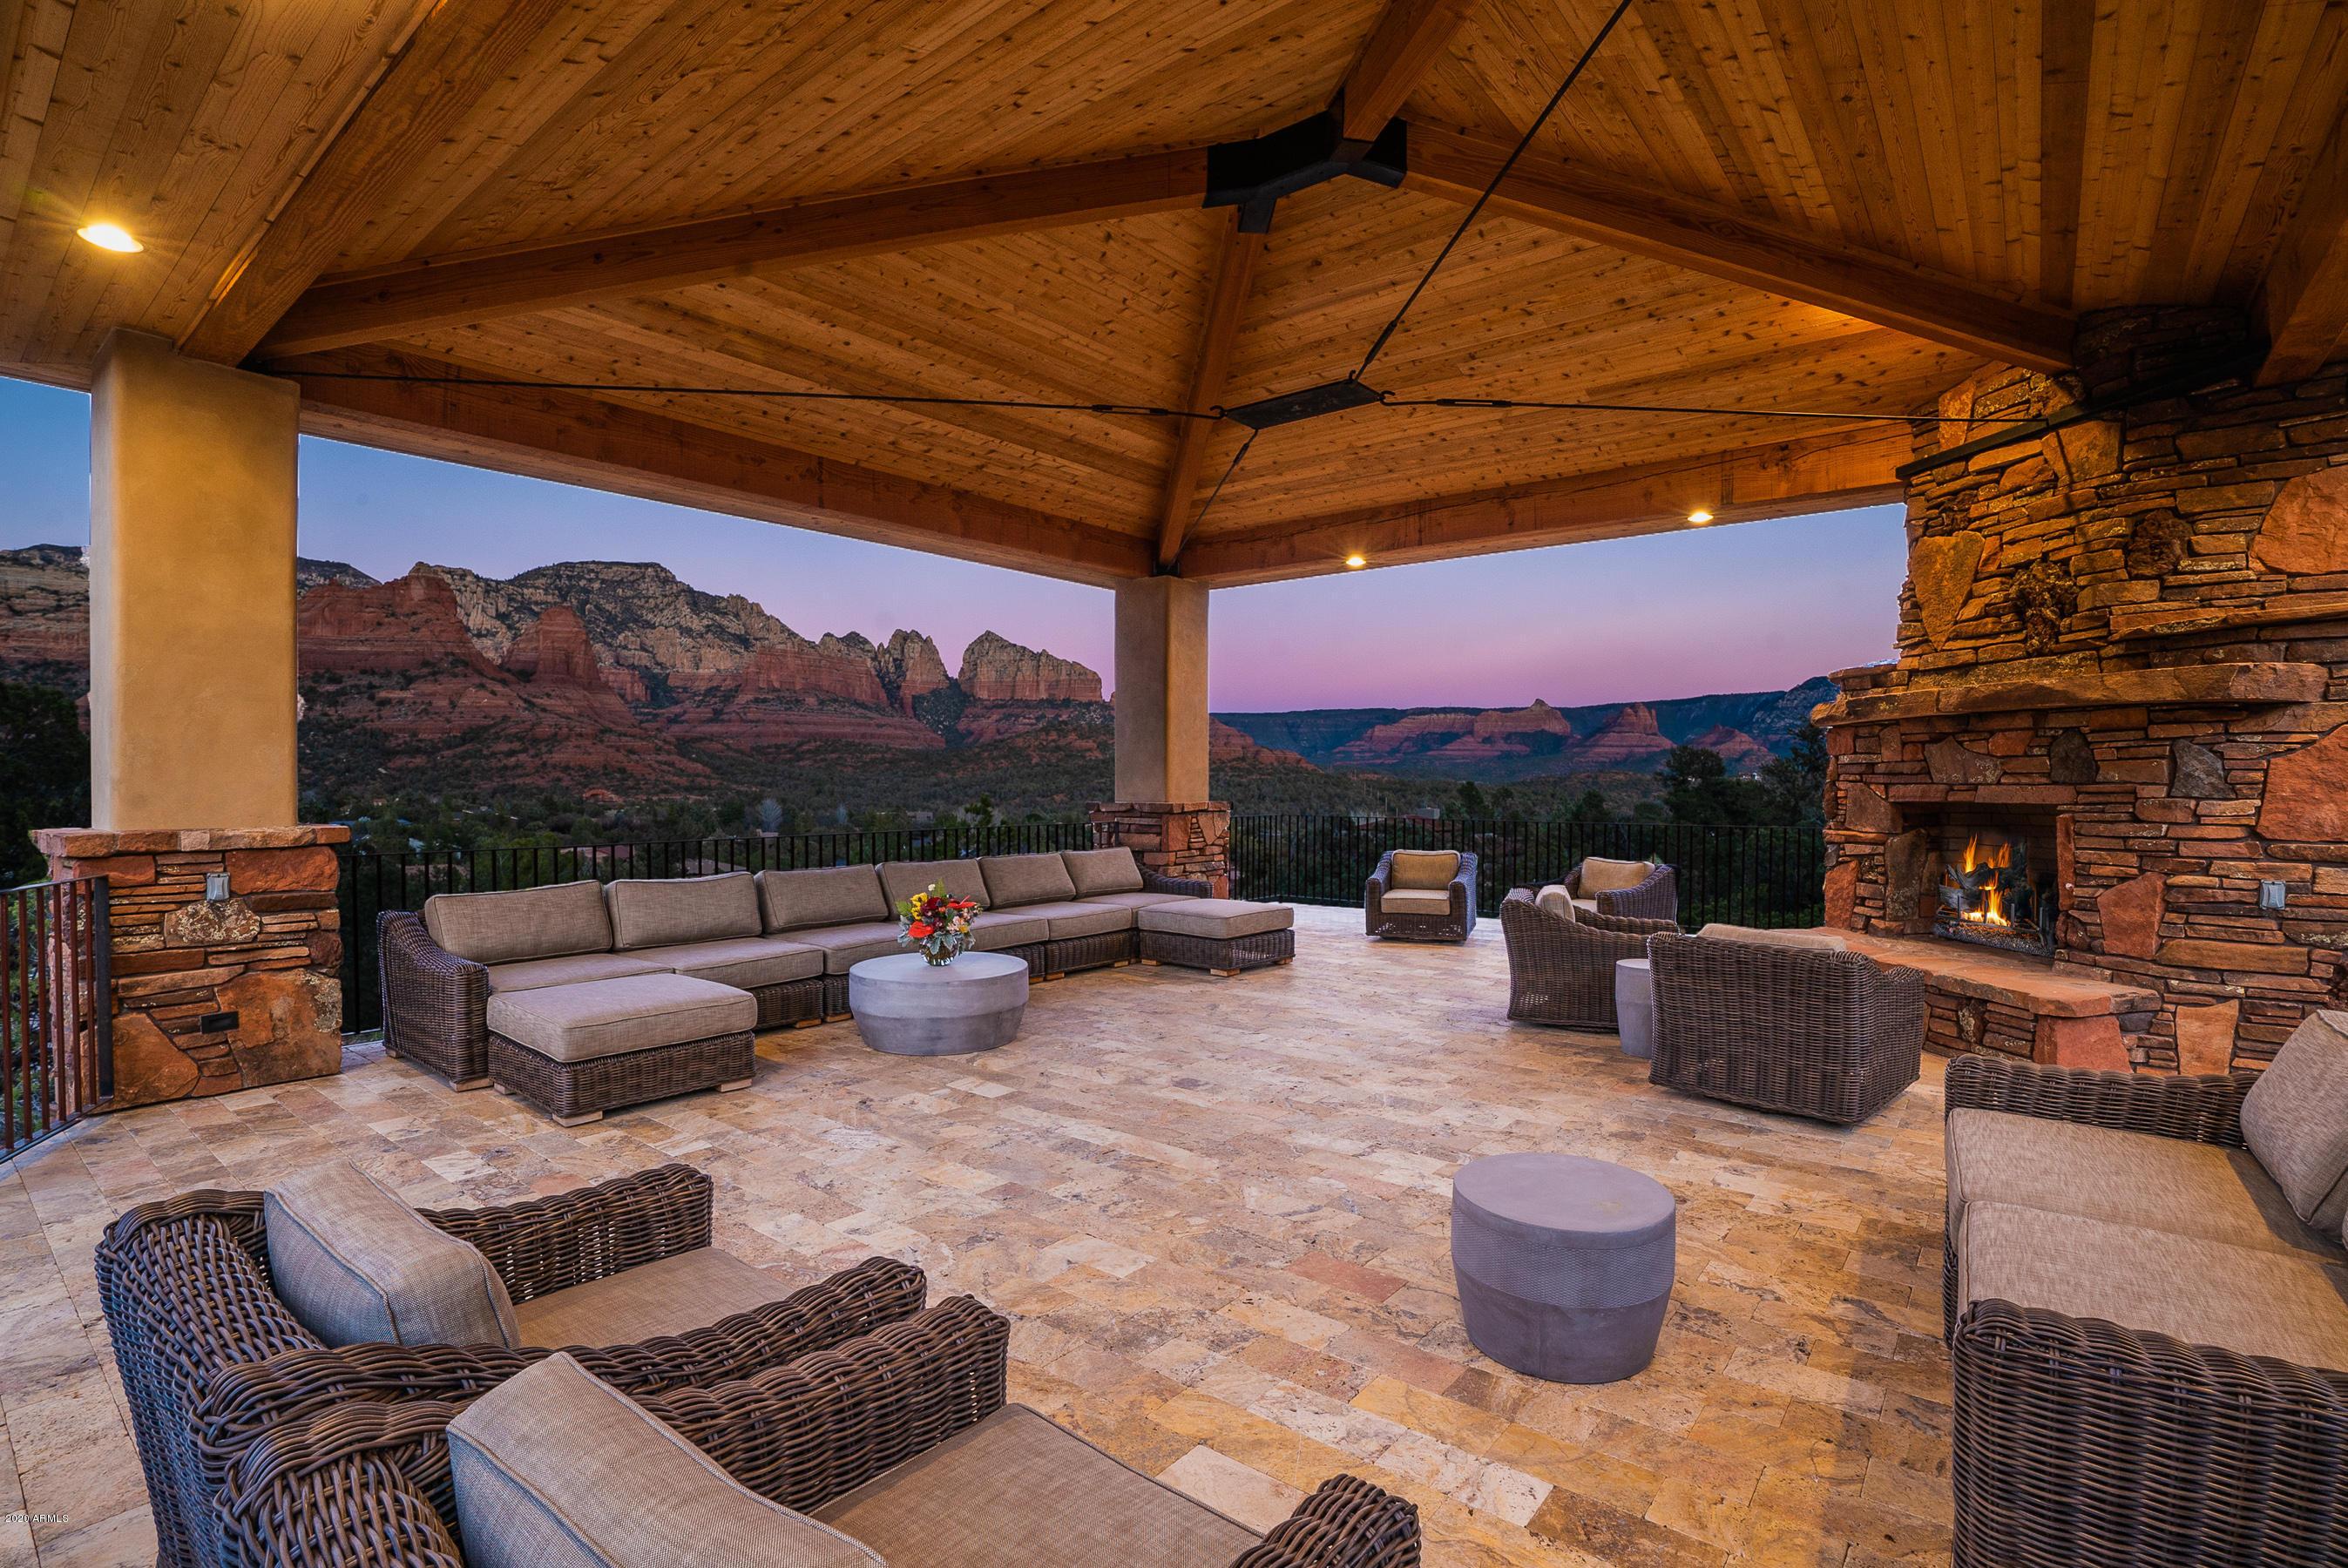 215 Shadow Rock Drive, Sedona, Arizona 86336, 3 Bedrooms Bedrooms, ,5 BathroomsBathrooms,Residential,For Sale,Shadow Rock,6030733